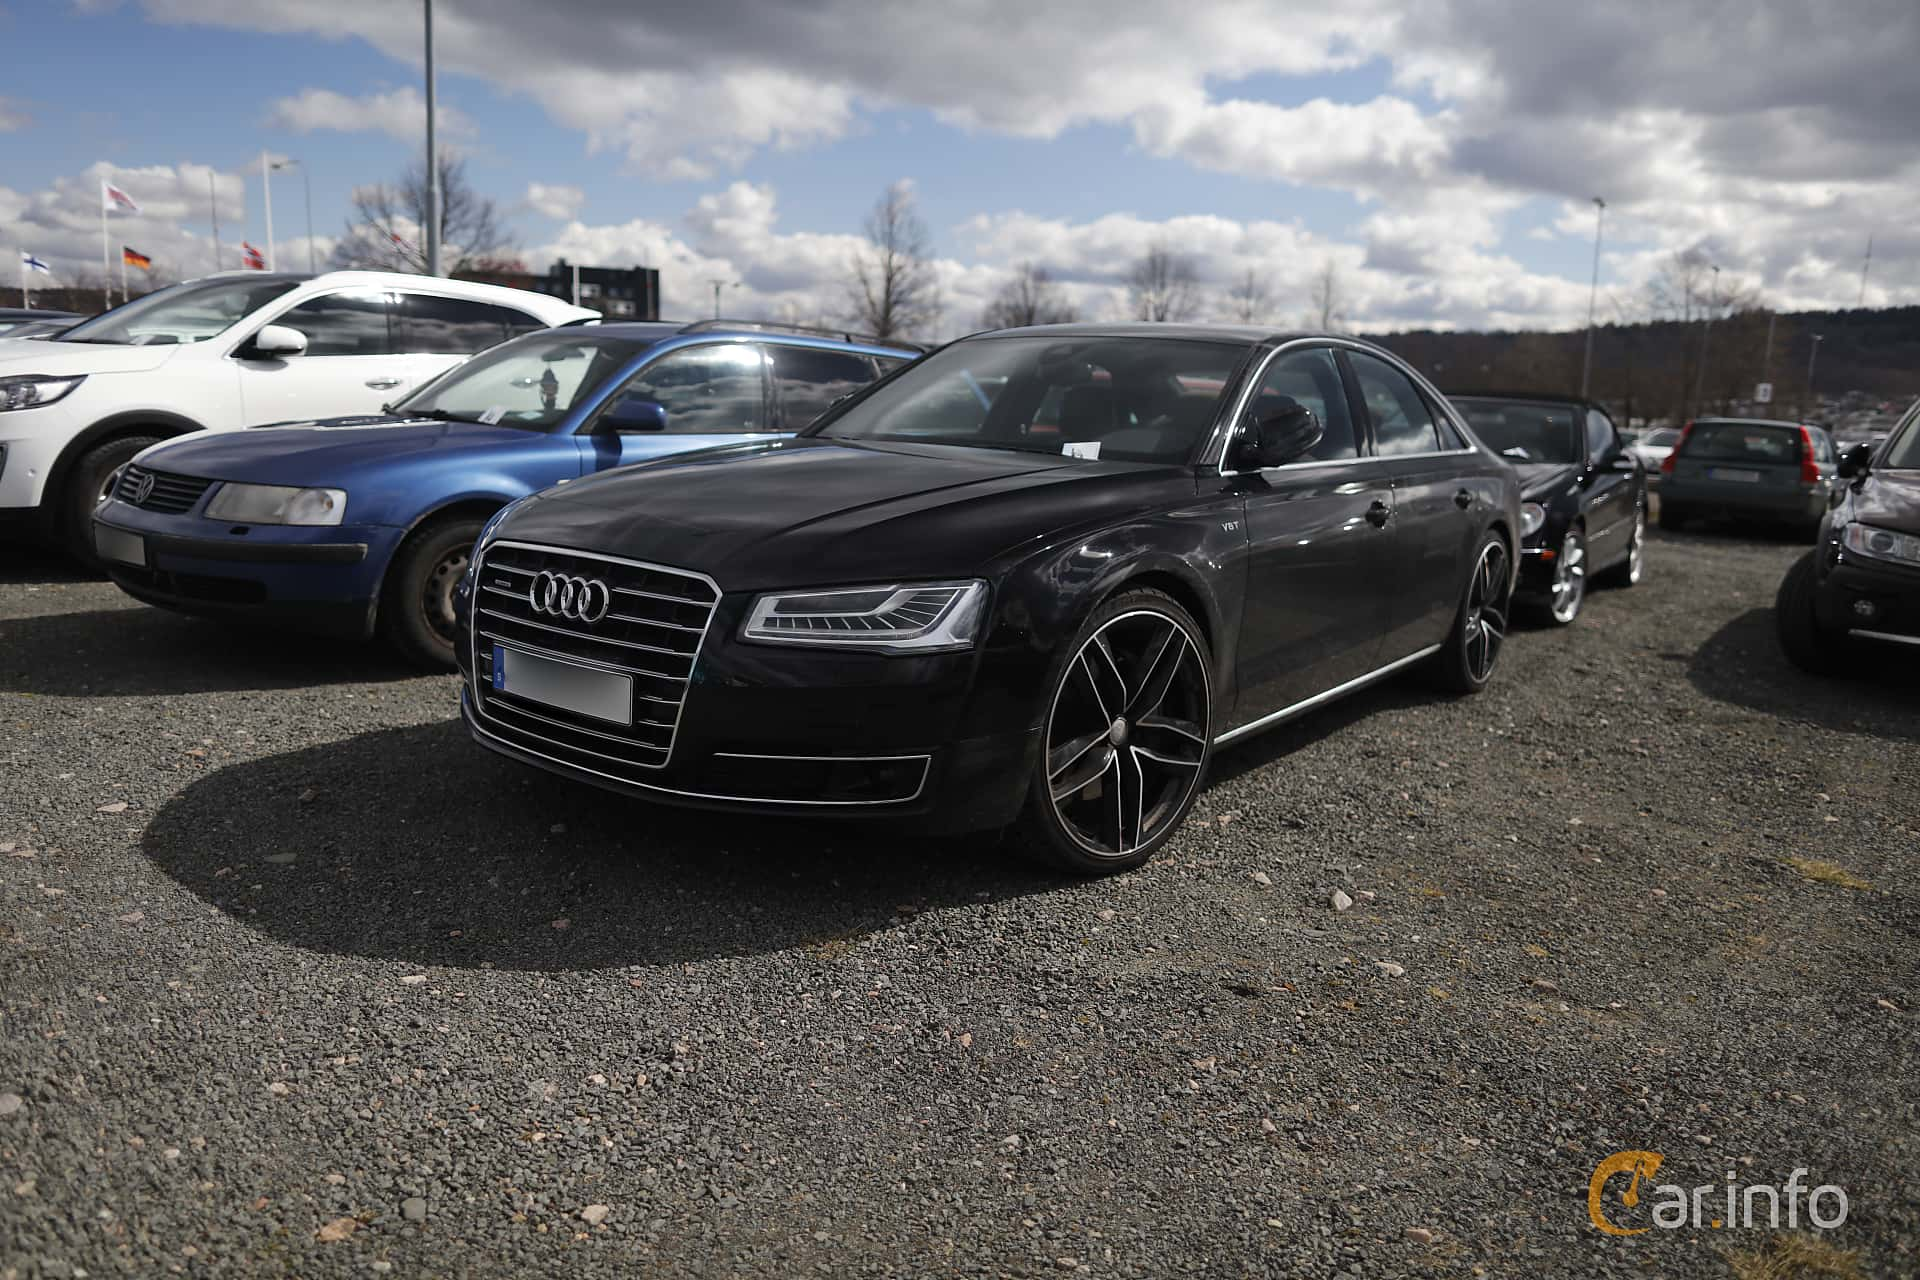 Kelebihan Audi 4.2 Tdi Review